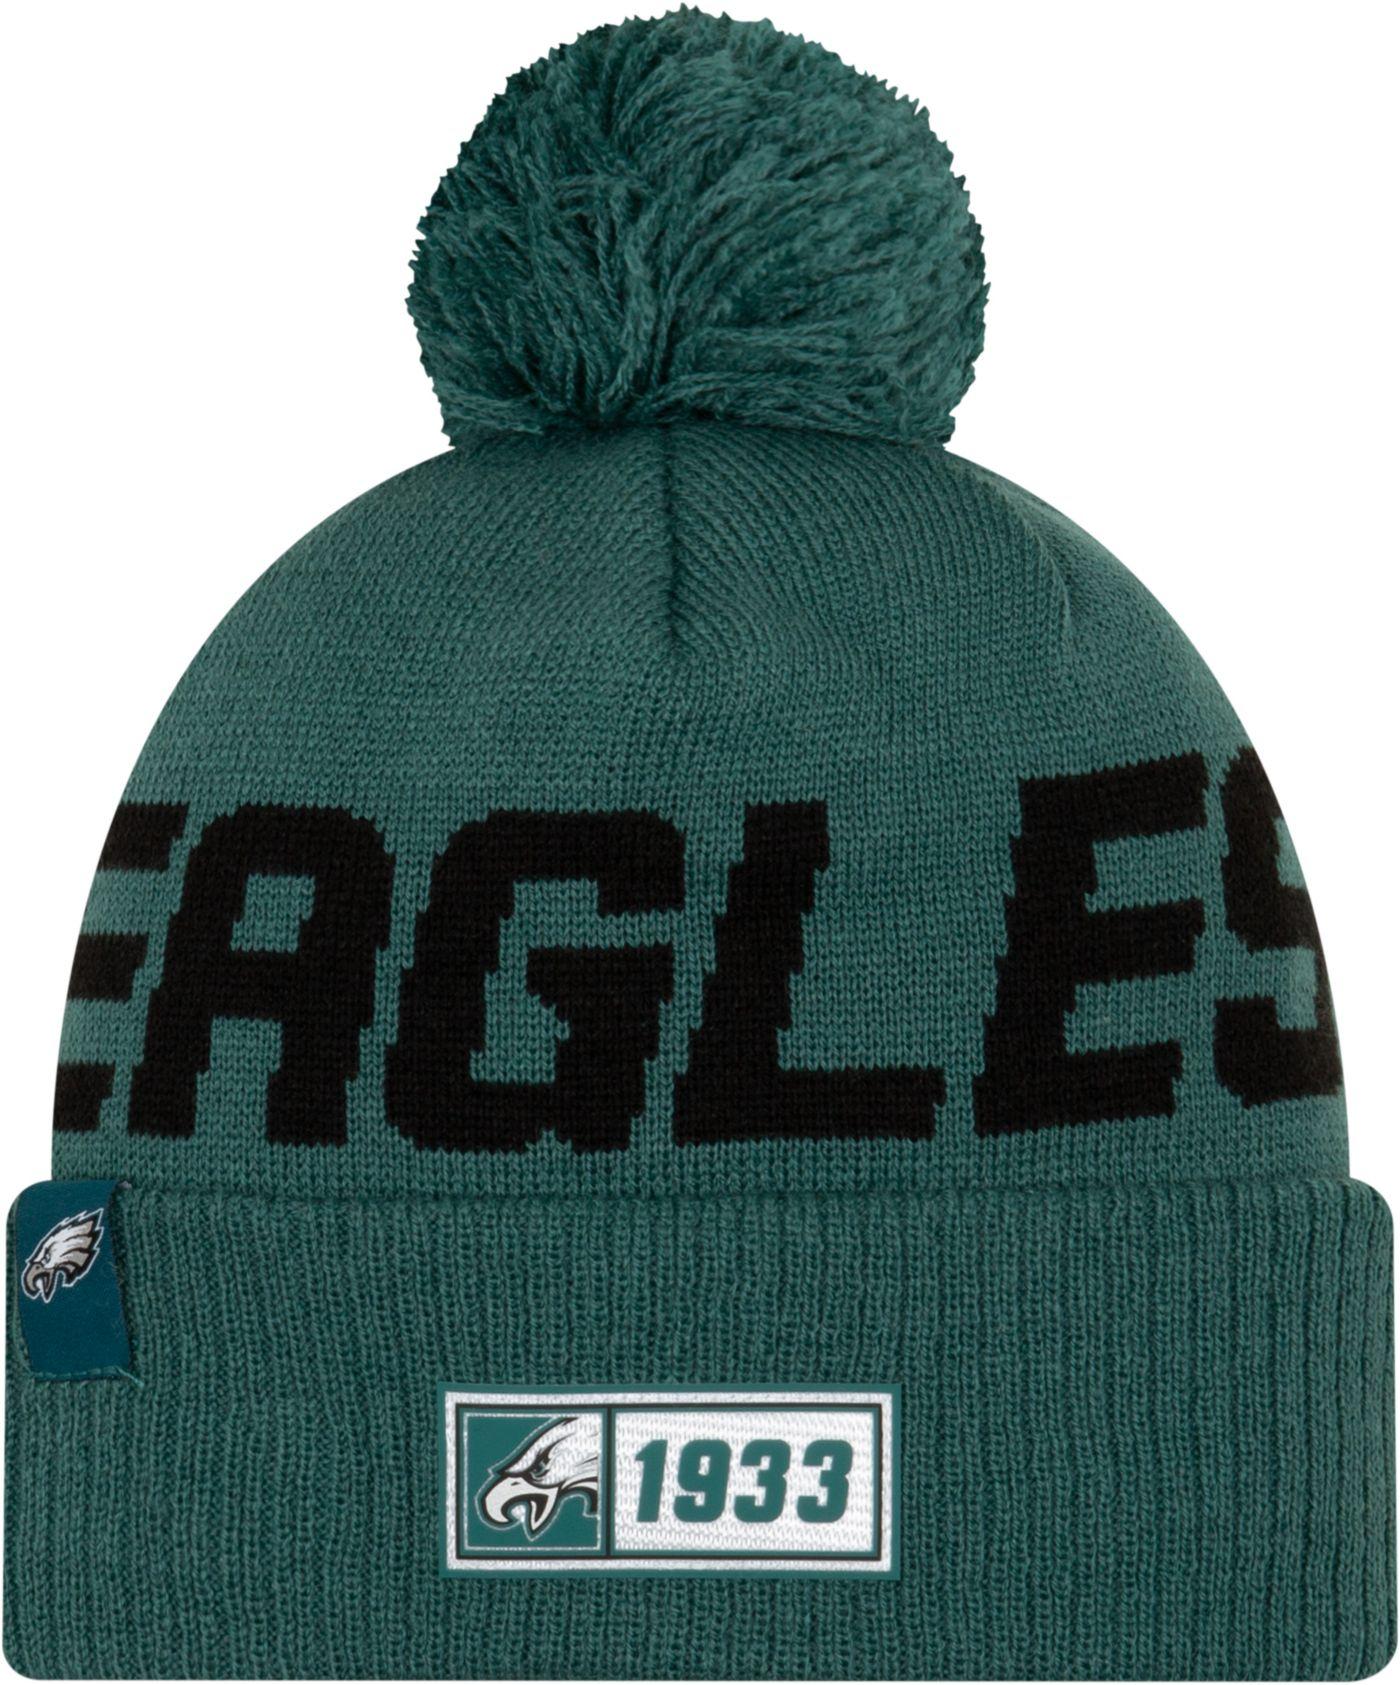 New Era Men's Philadelphia Eagles Sideline Road Sport Pom Knit